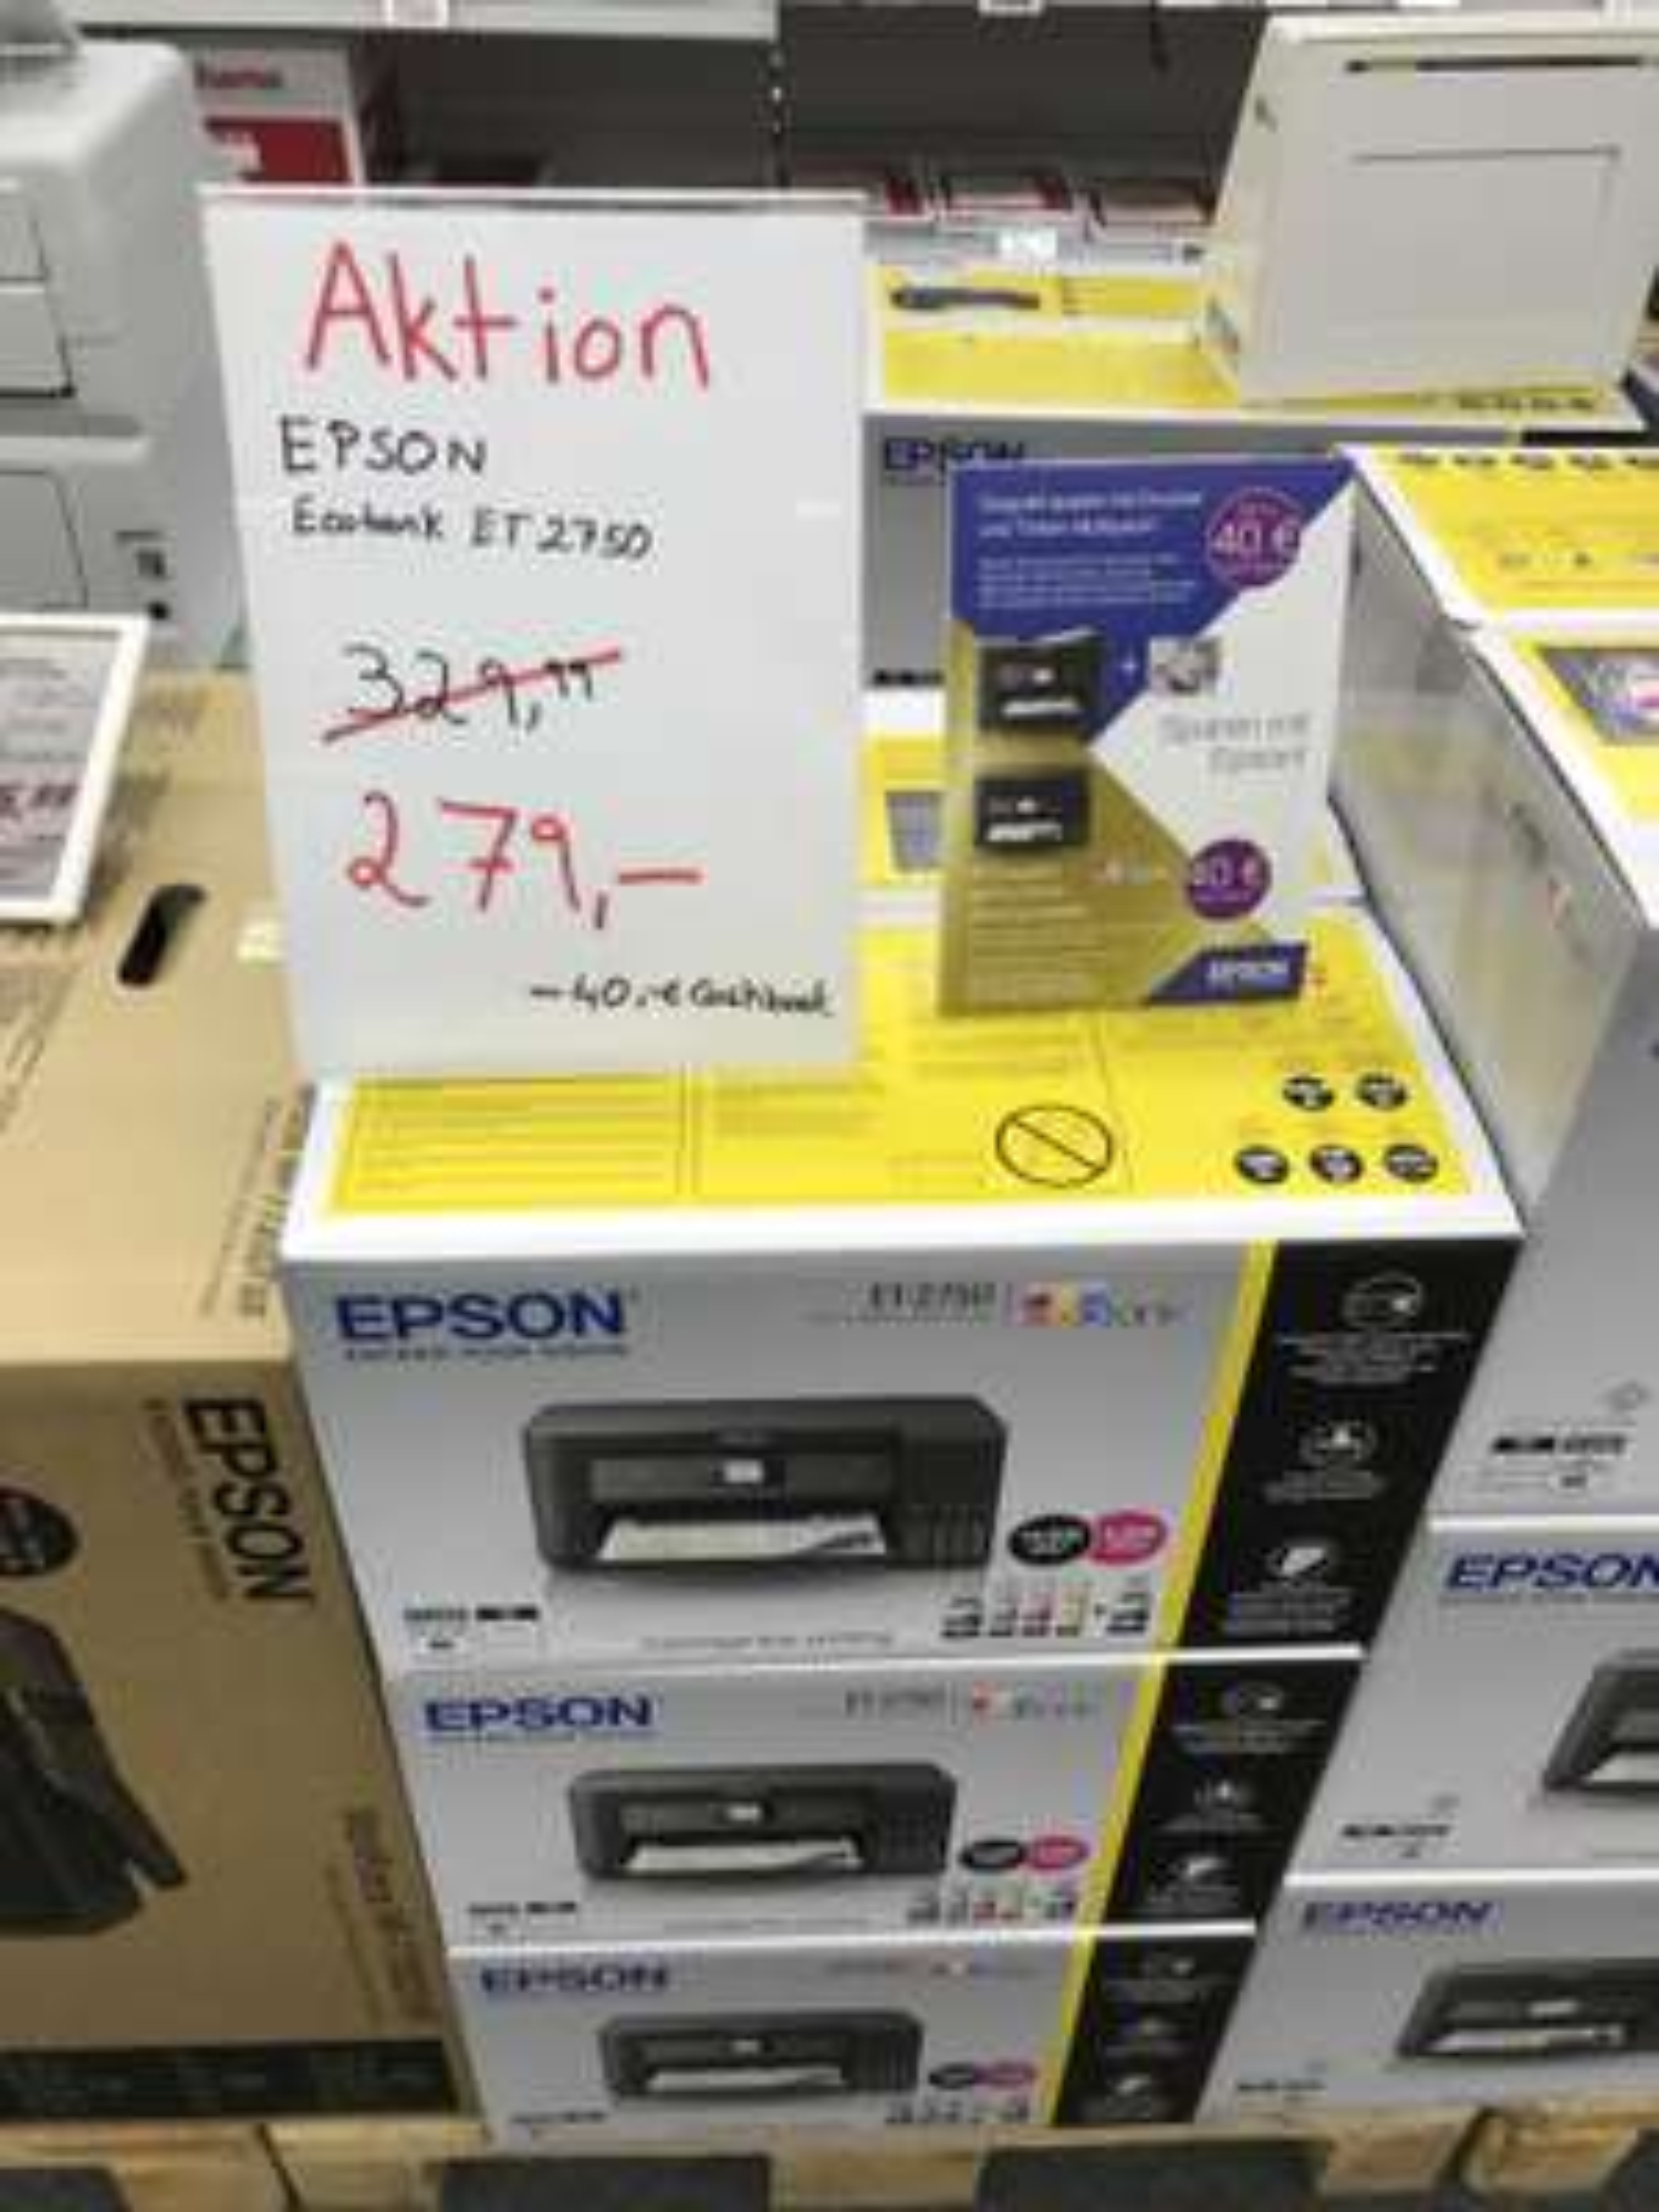 [Lokal HD] Epson EcoTank 2750 OsterAktion + 40€ Cashback